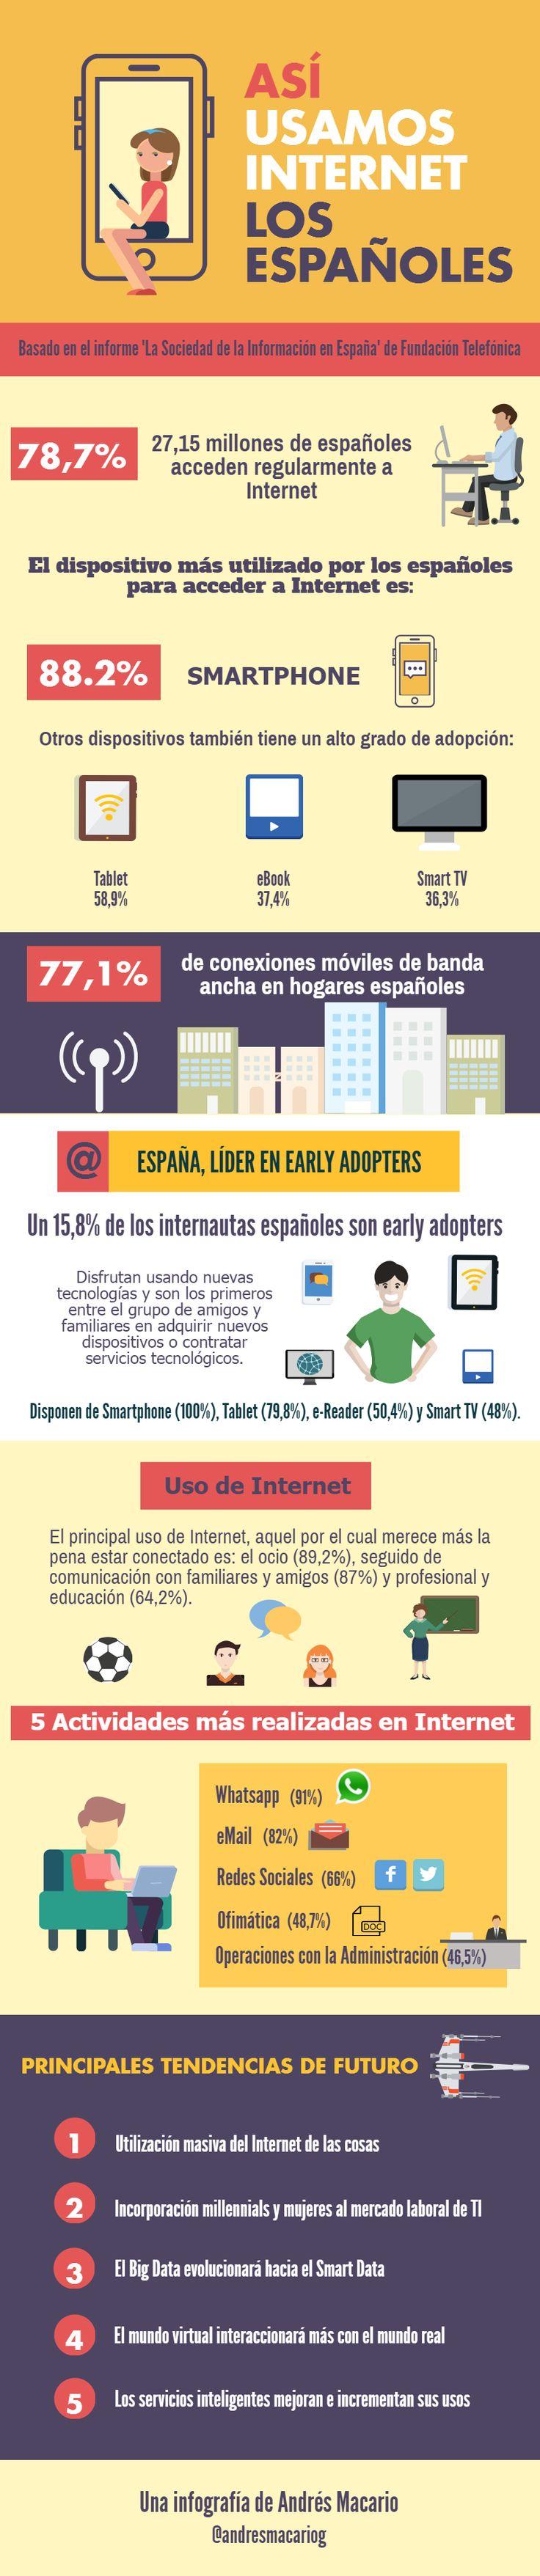 Así usamos Internet los Españoles #infografia